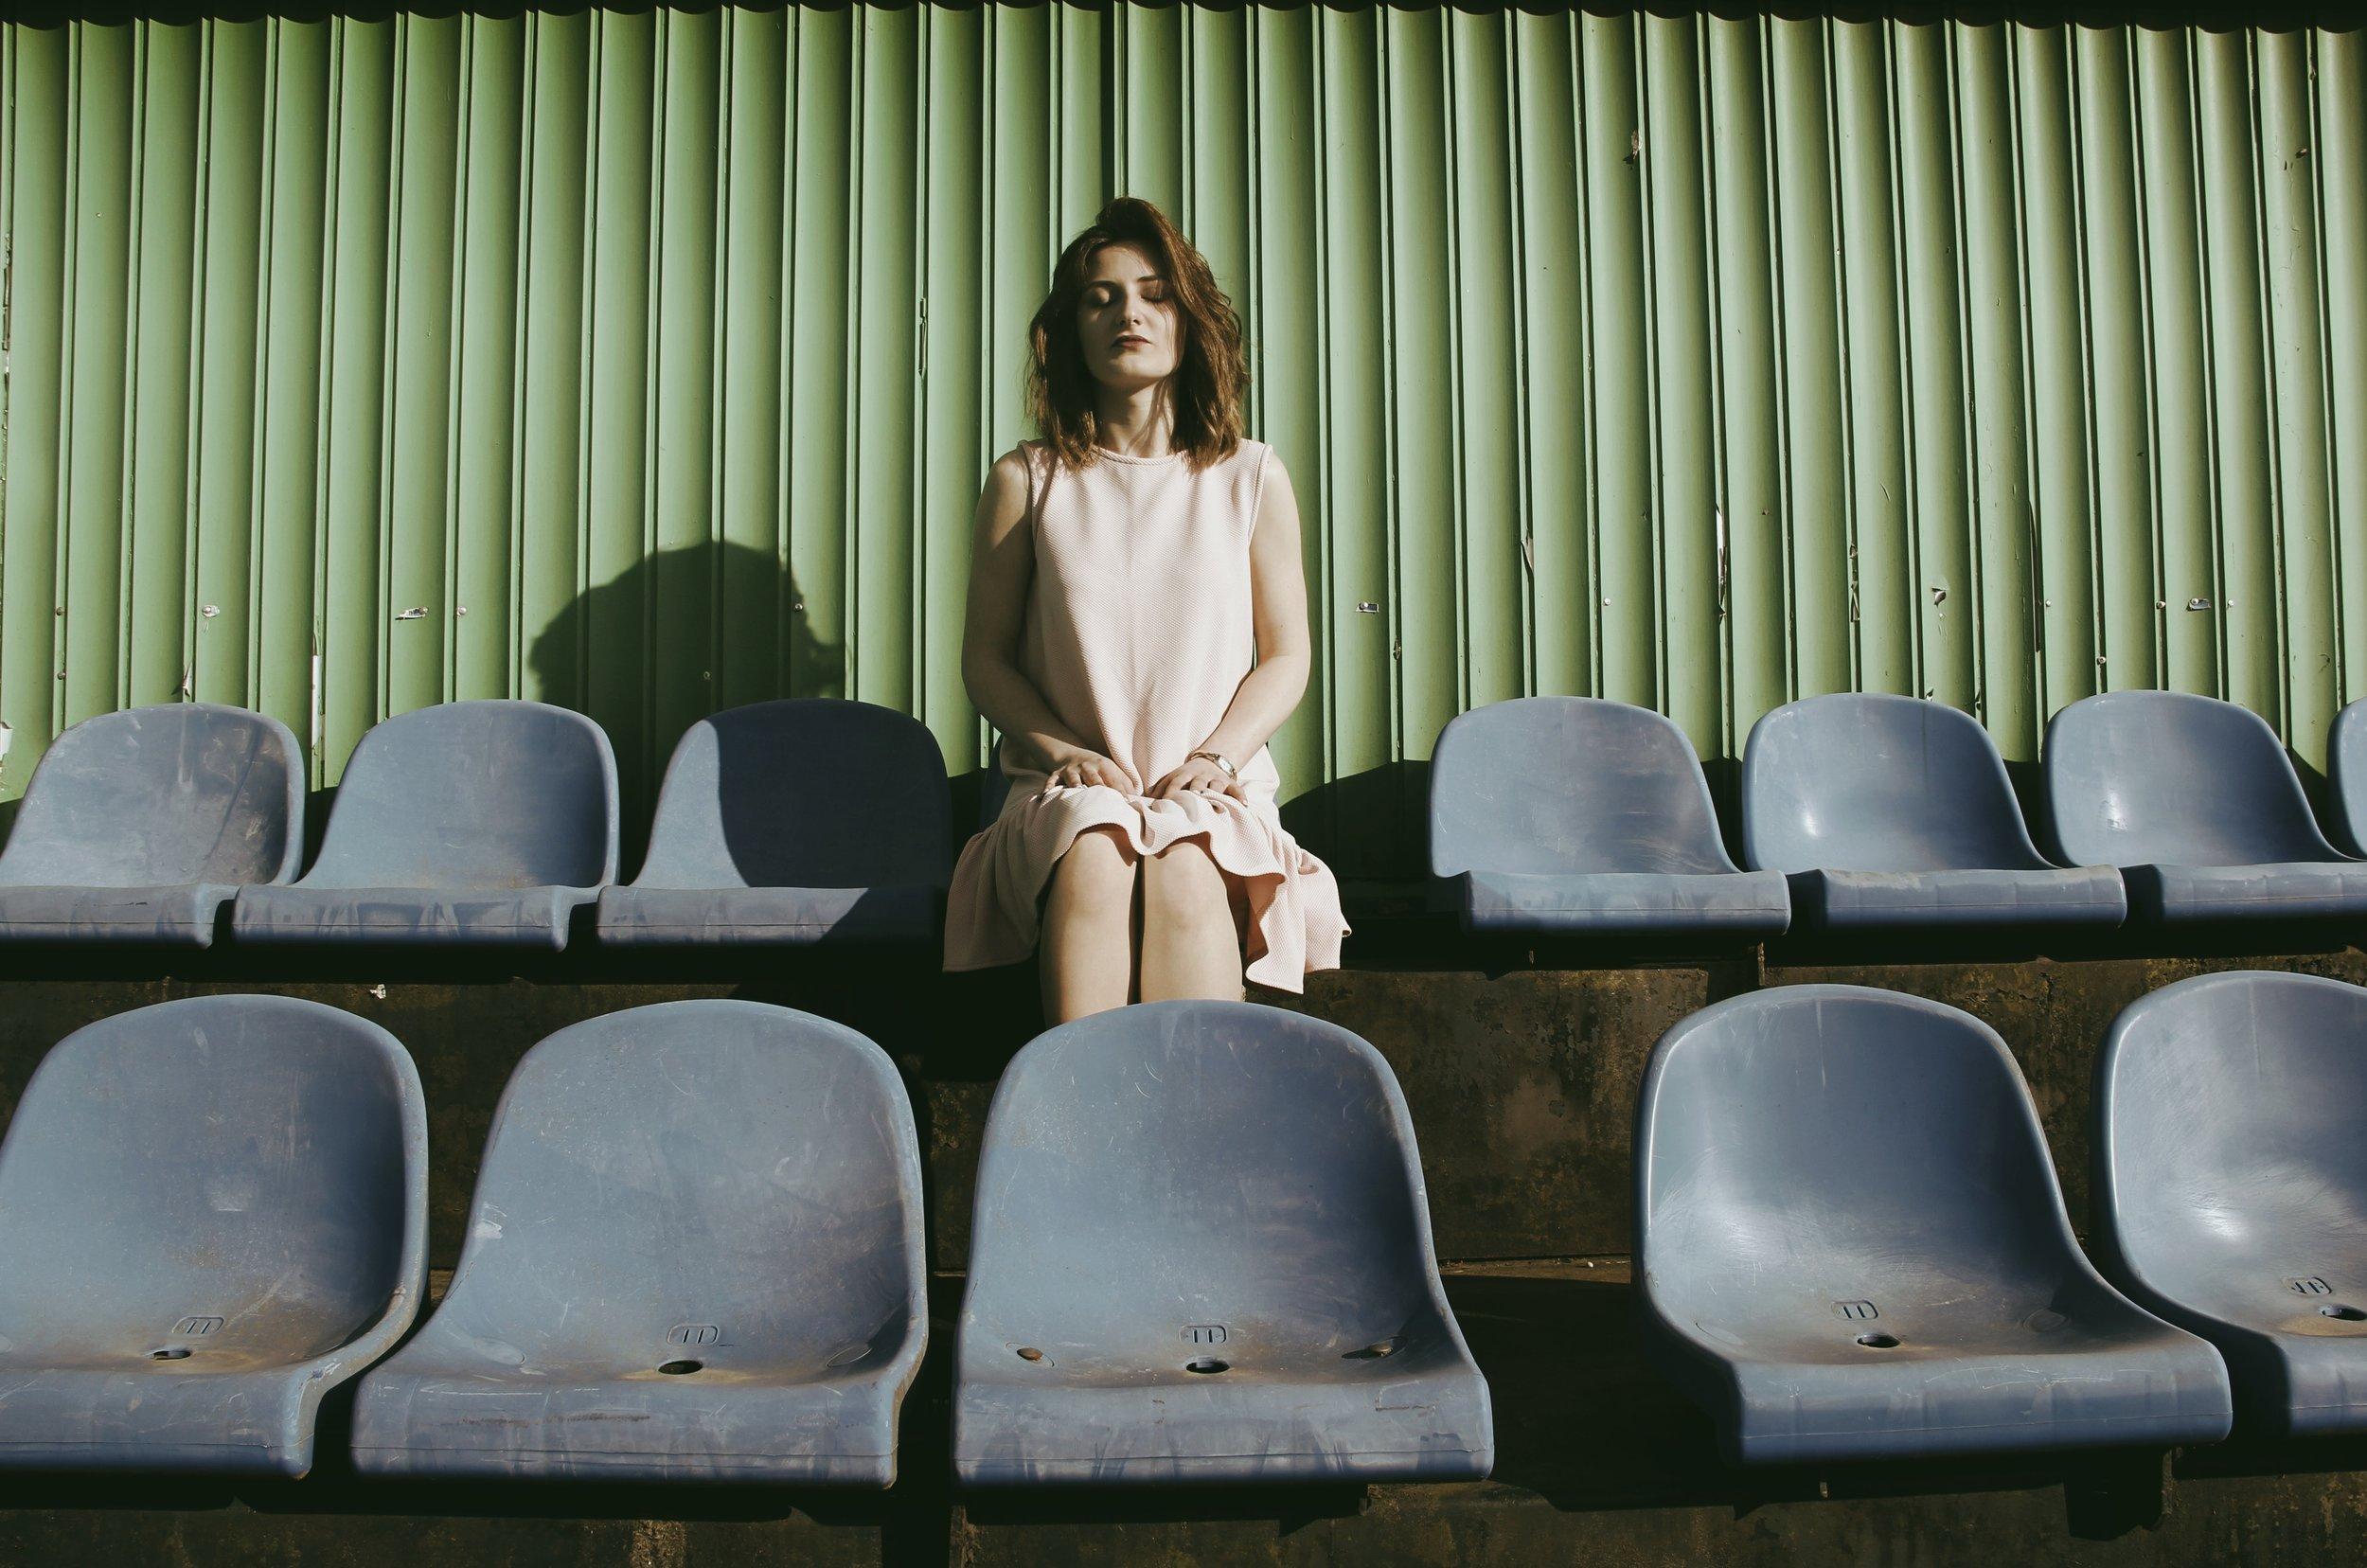 woman meditating on empty stadium seats